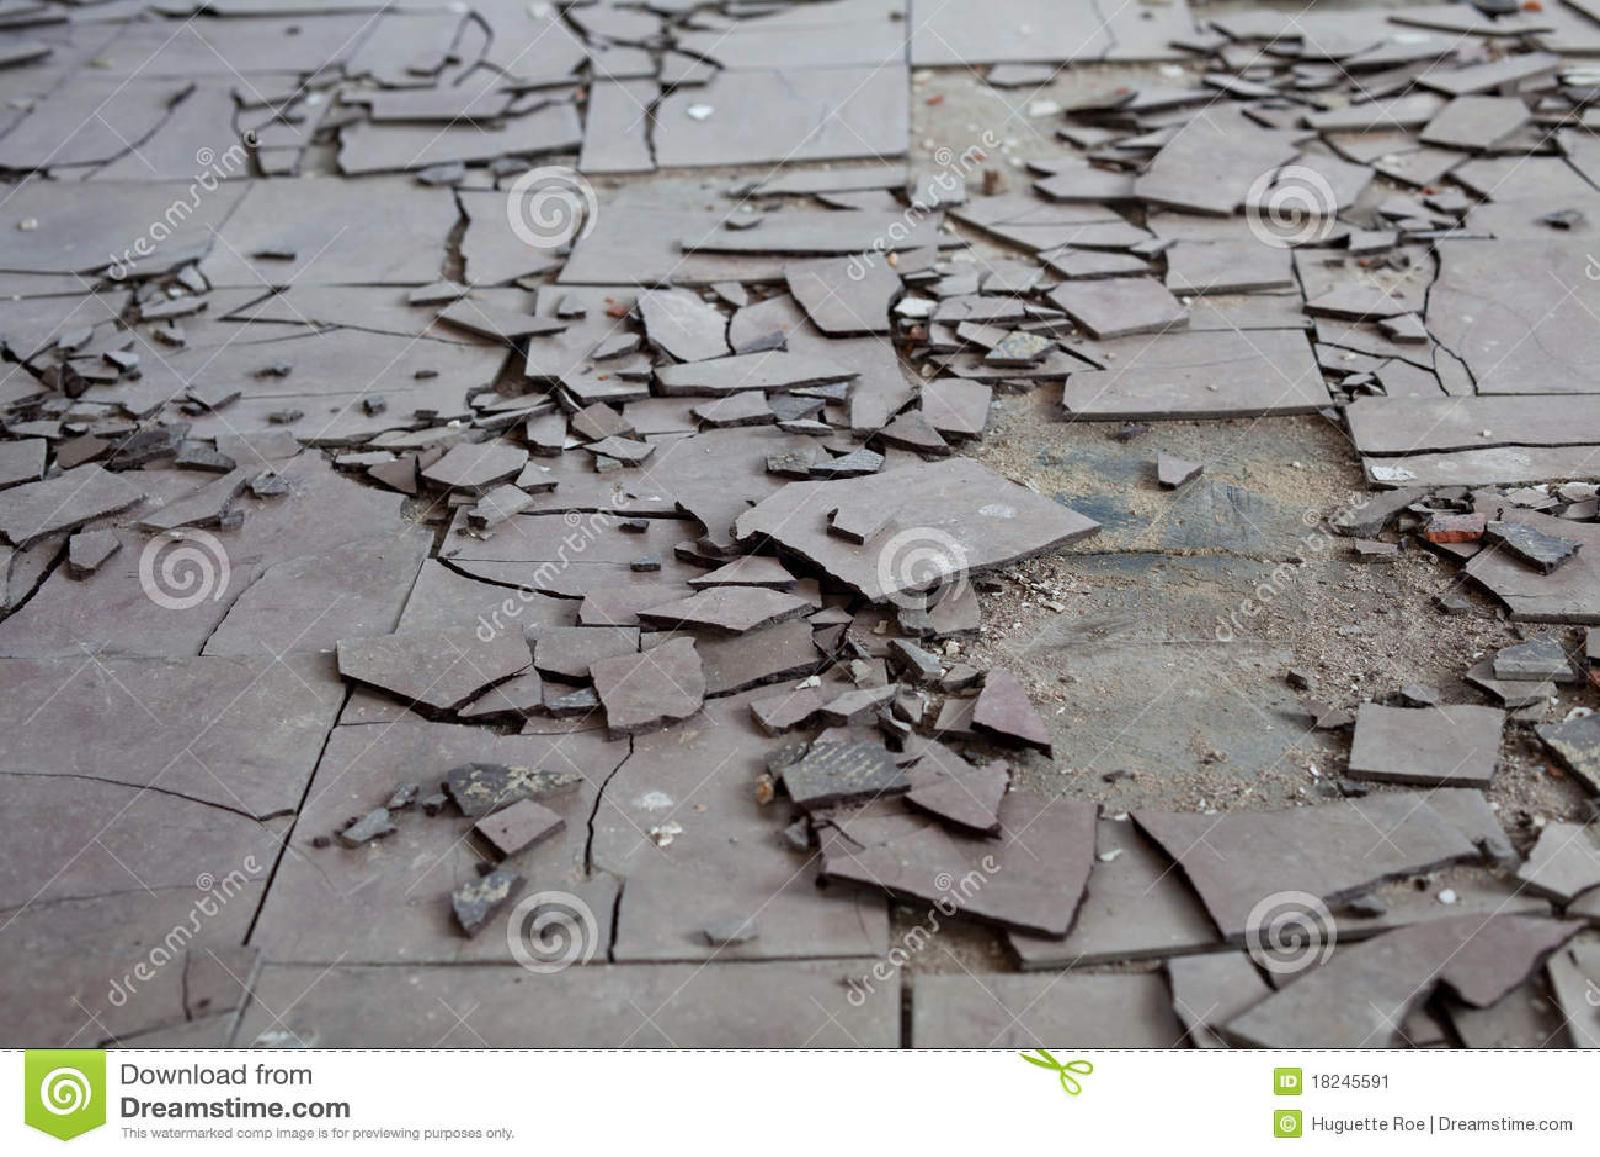 Asbestos tiles stock image. Image of danger, weathered - 18245591